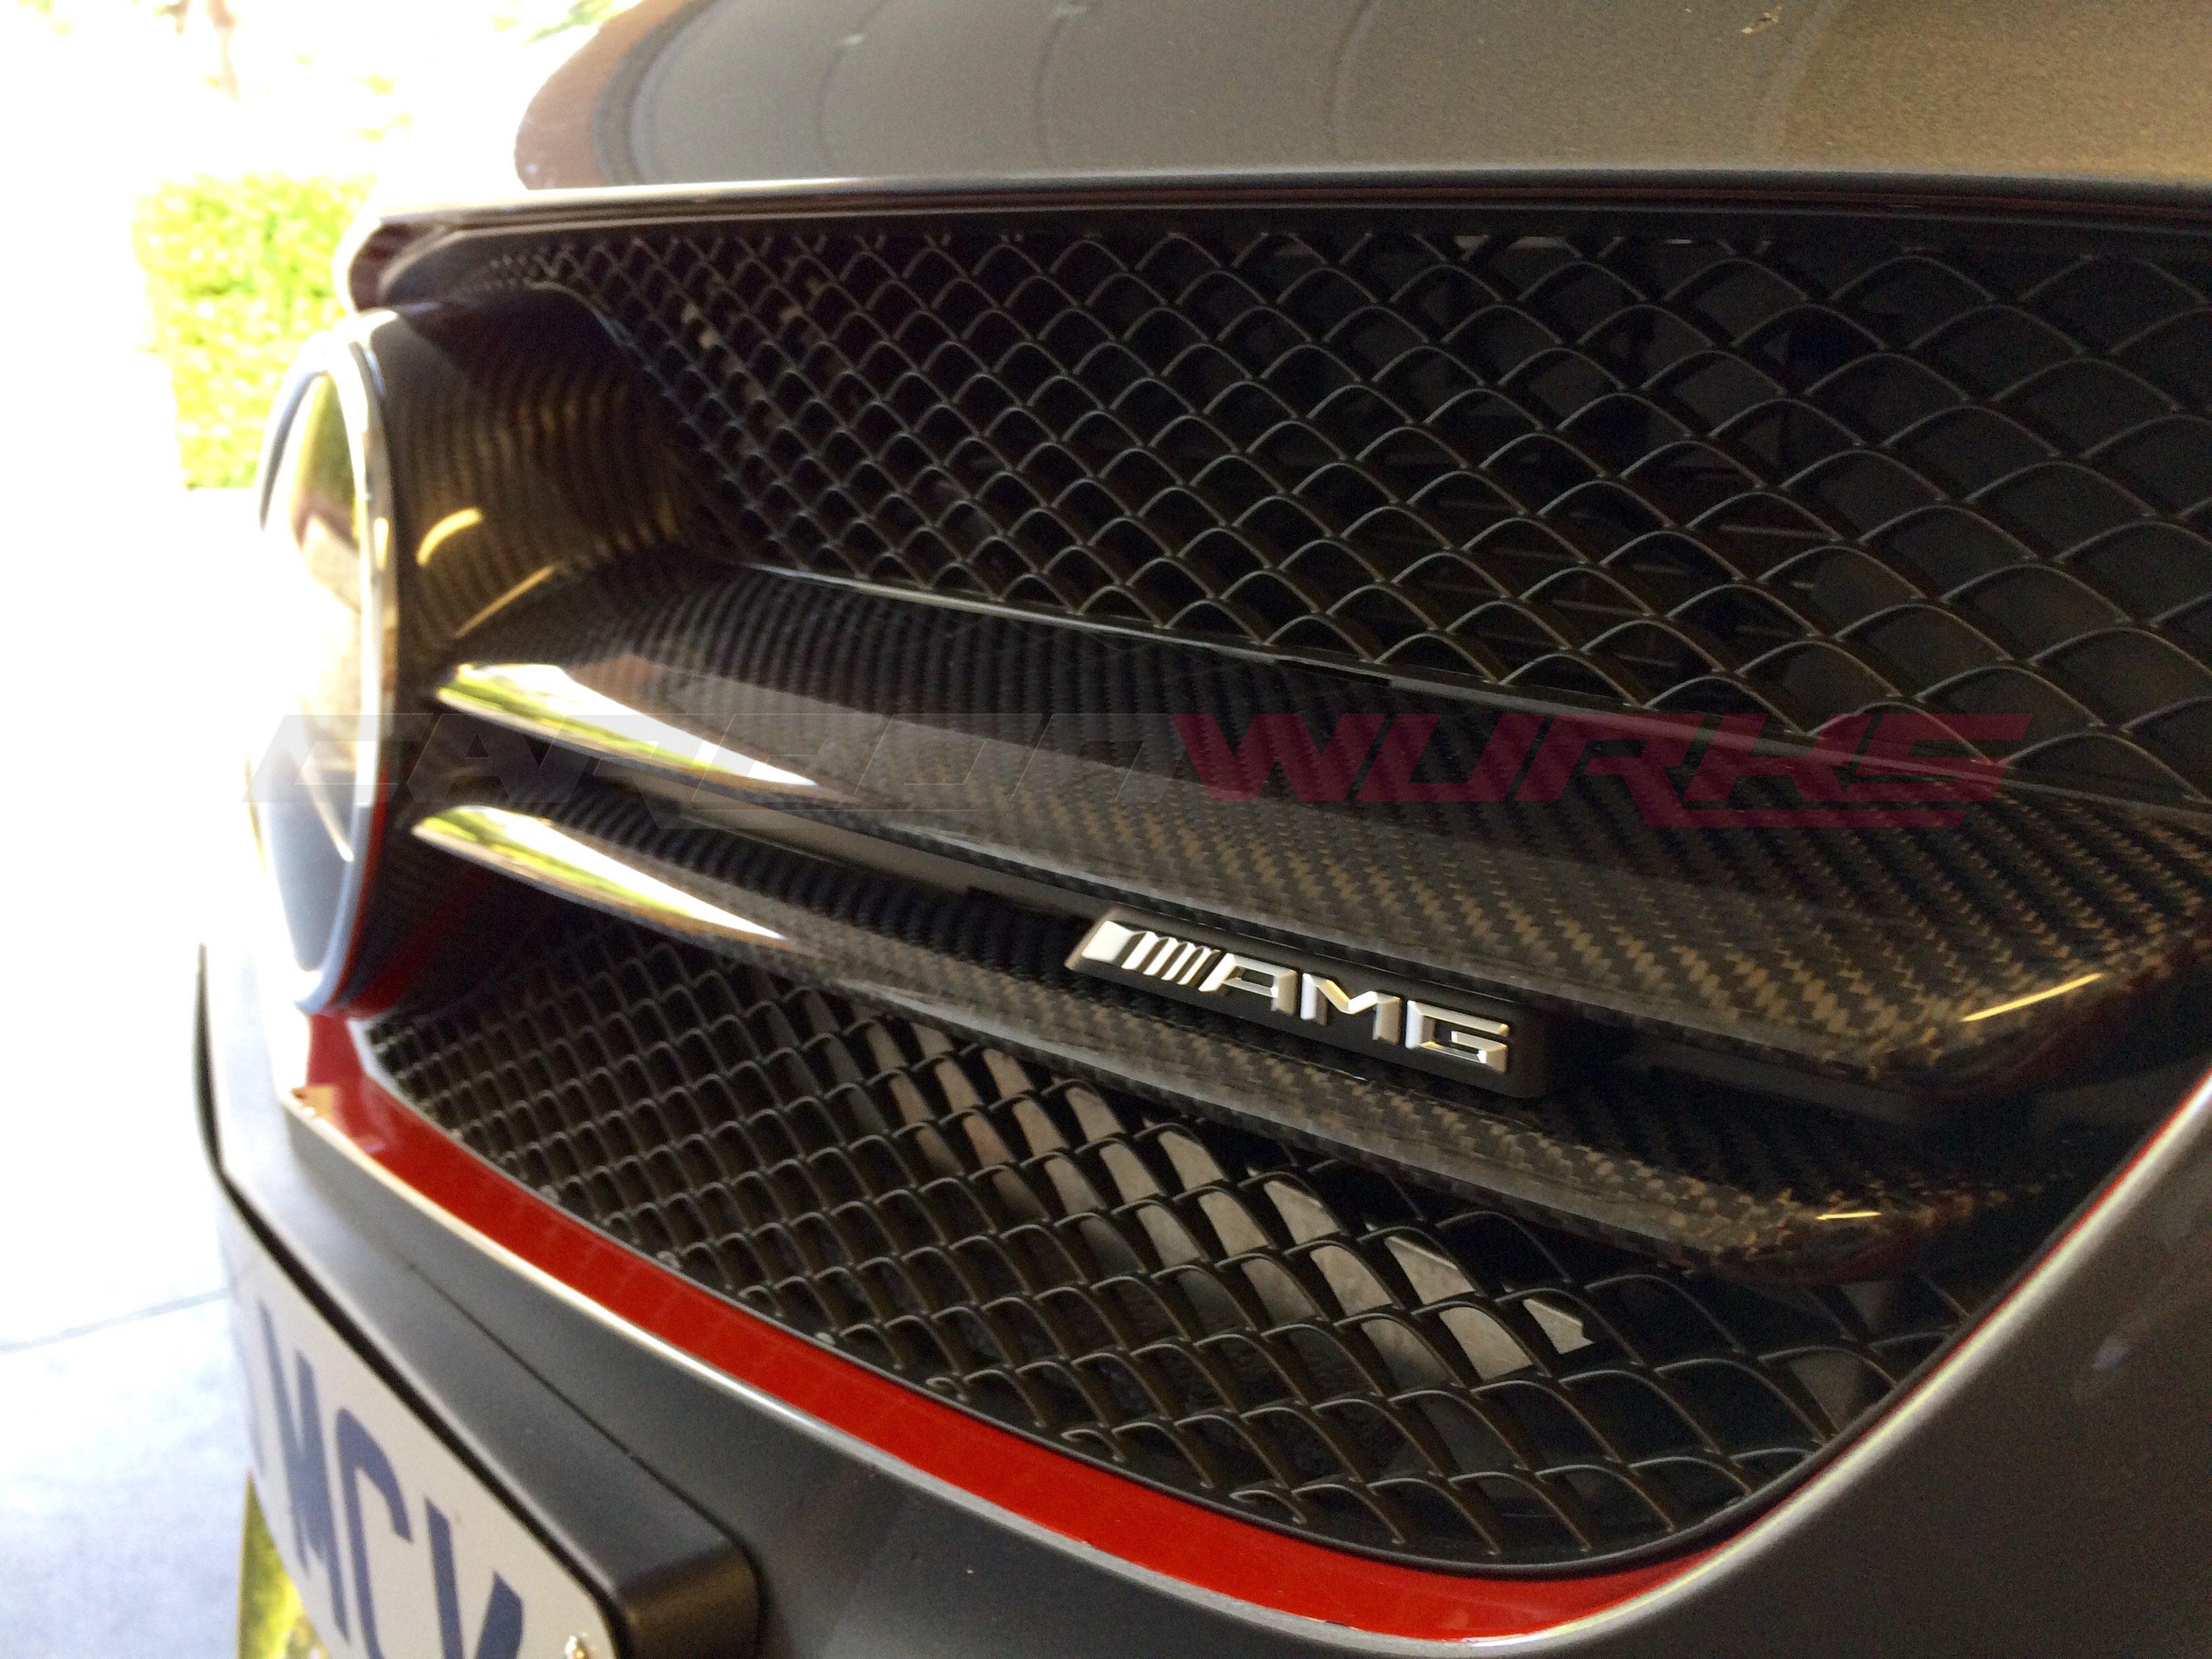 Mercedes Benz A45 AMG Carbon Fibre Grille